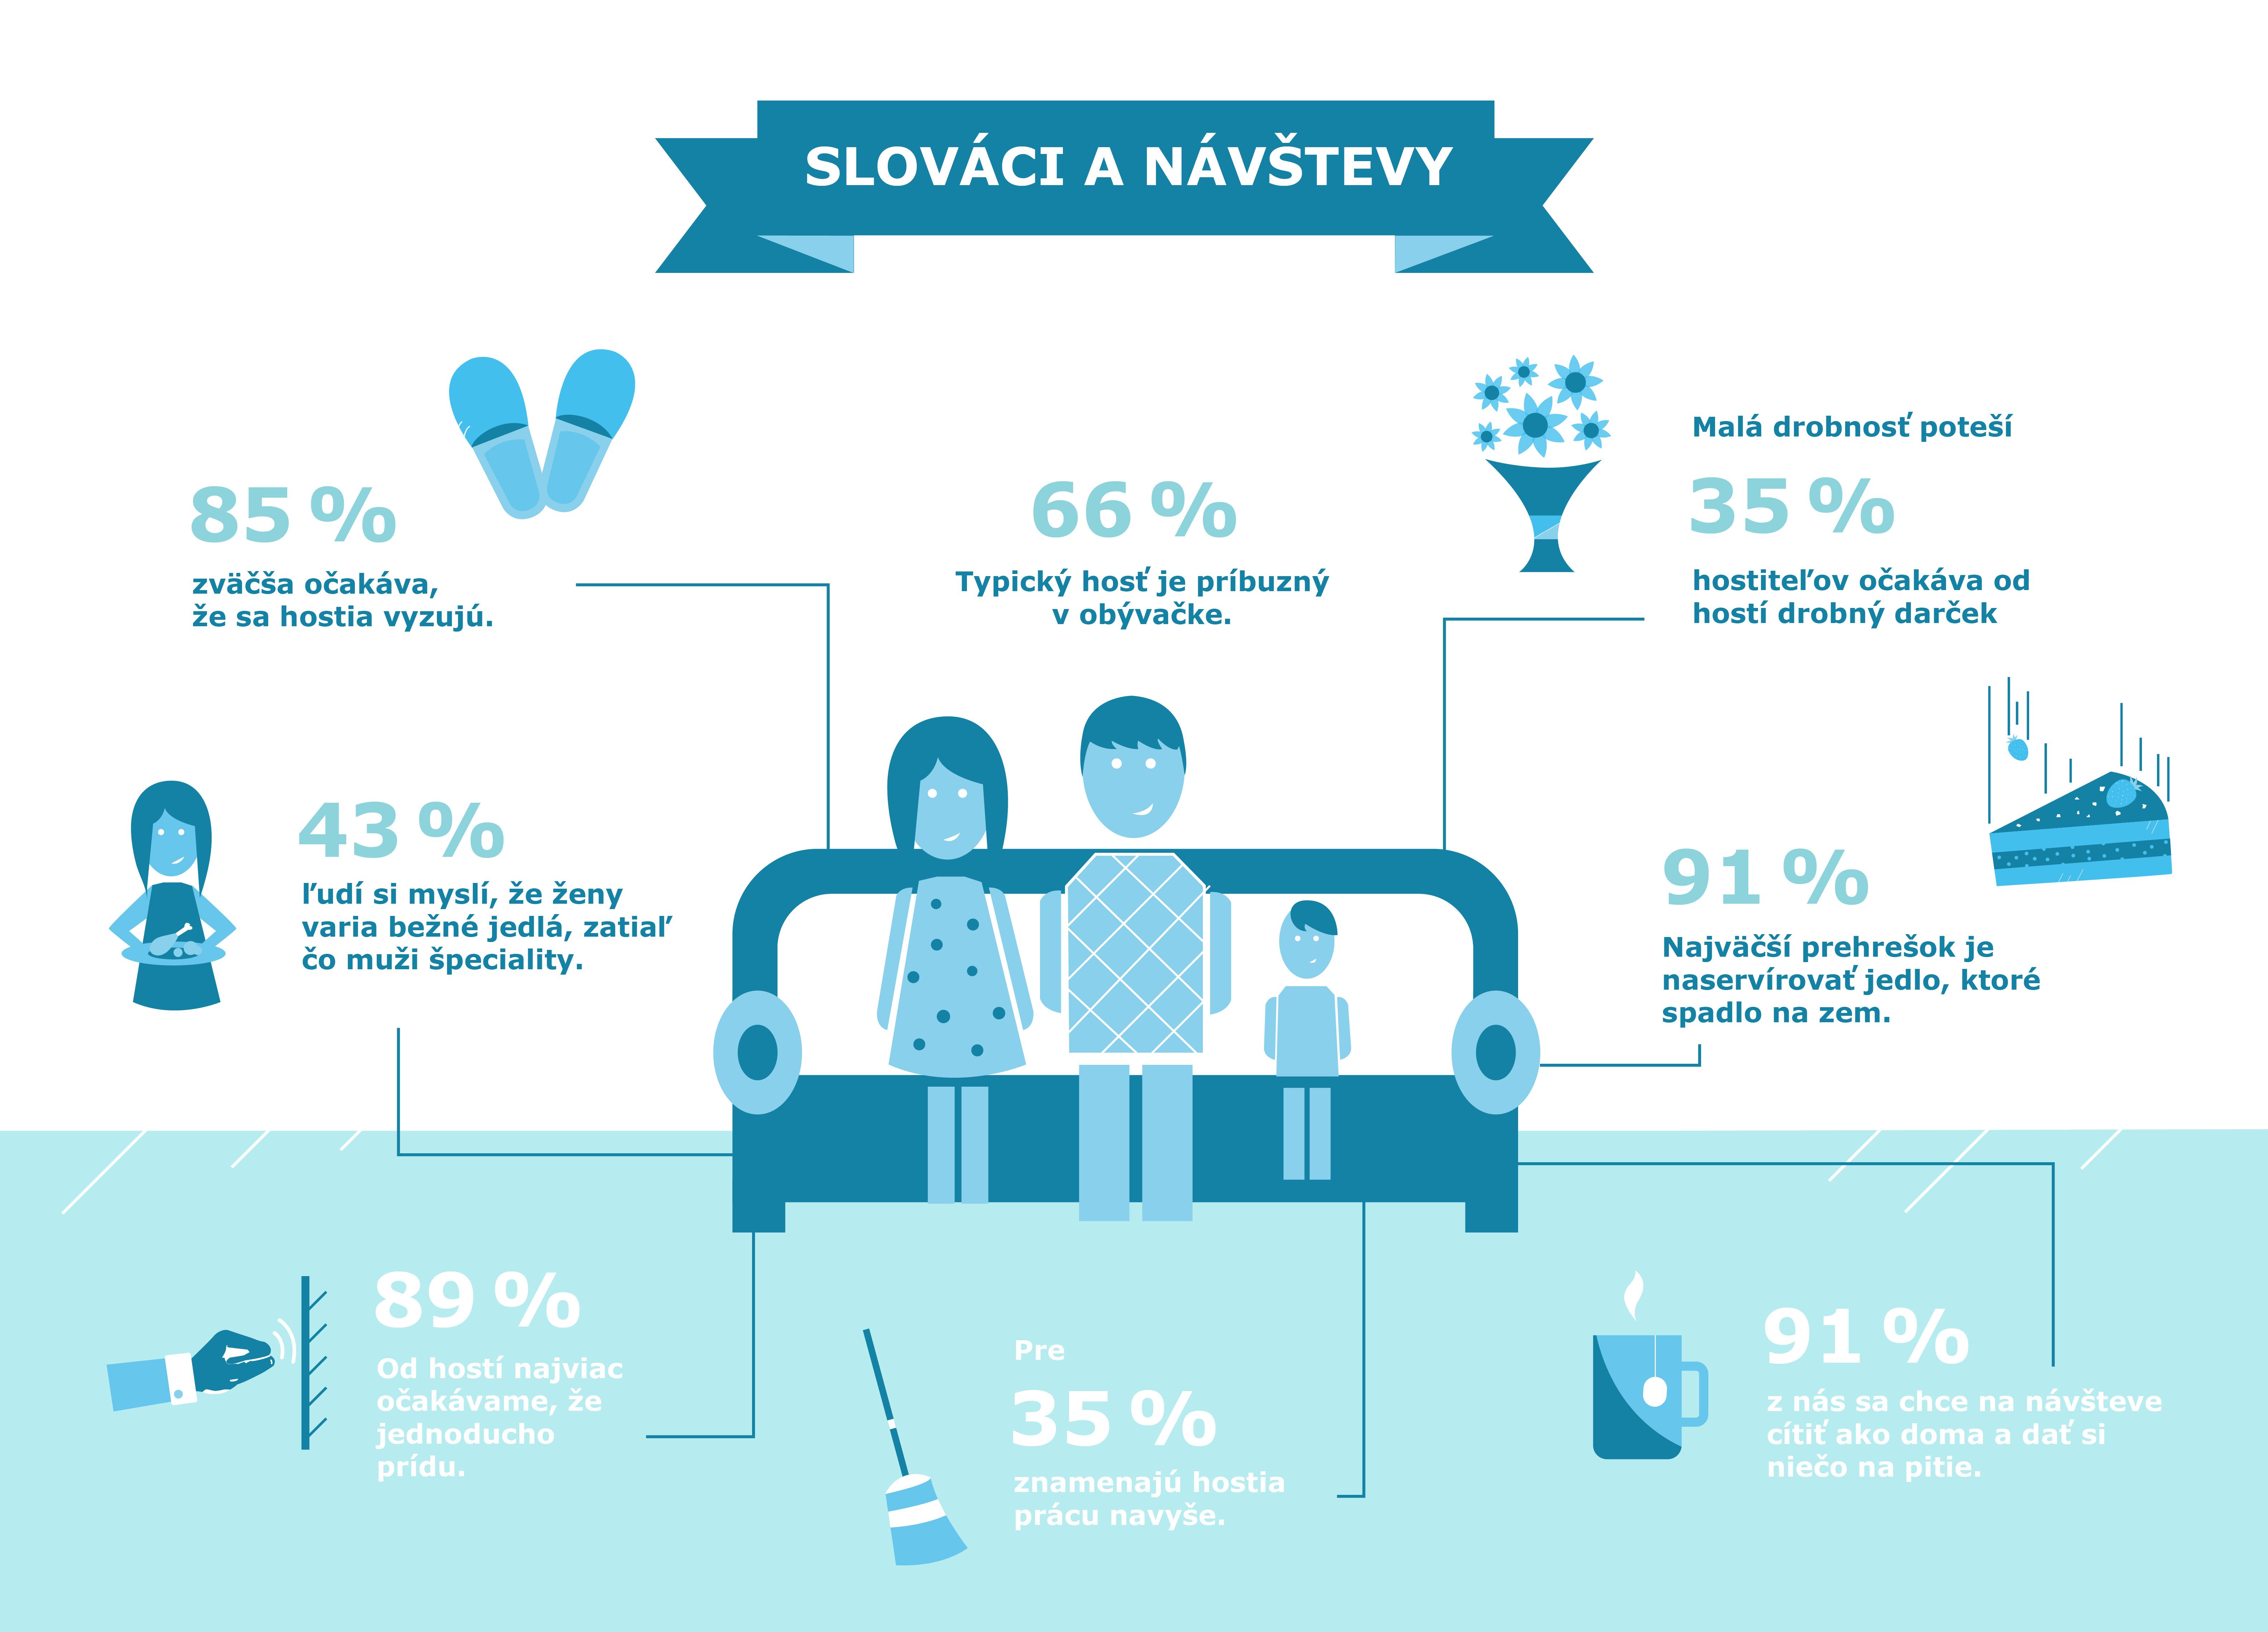 Slovaci a navstevy 2_nowat